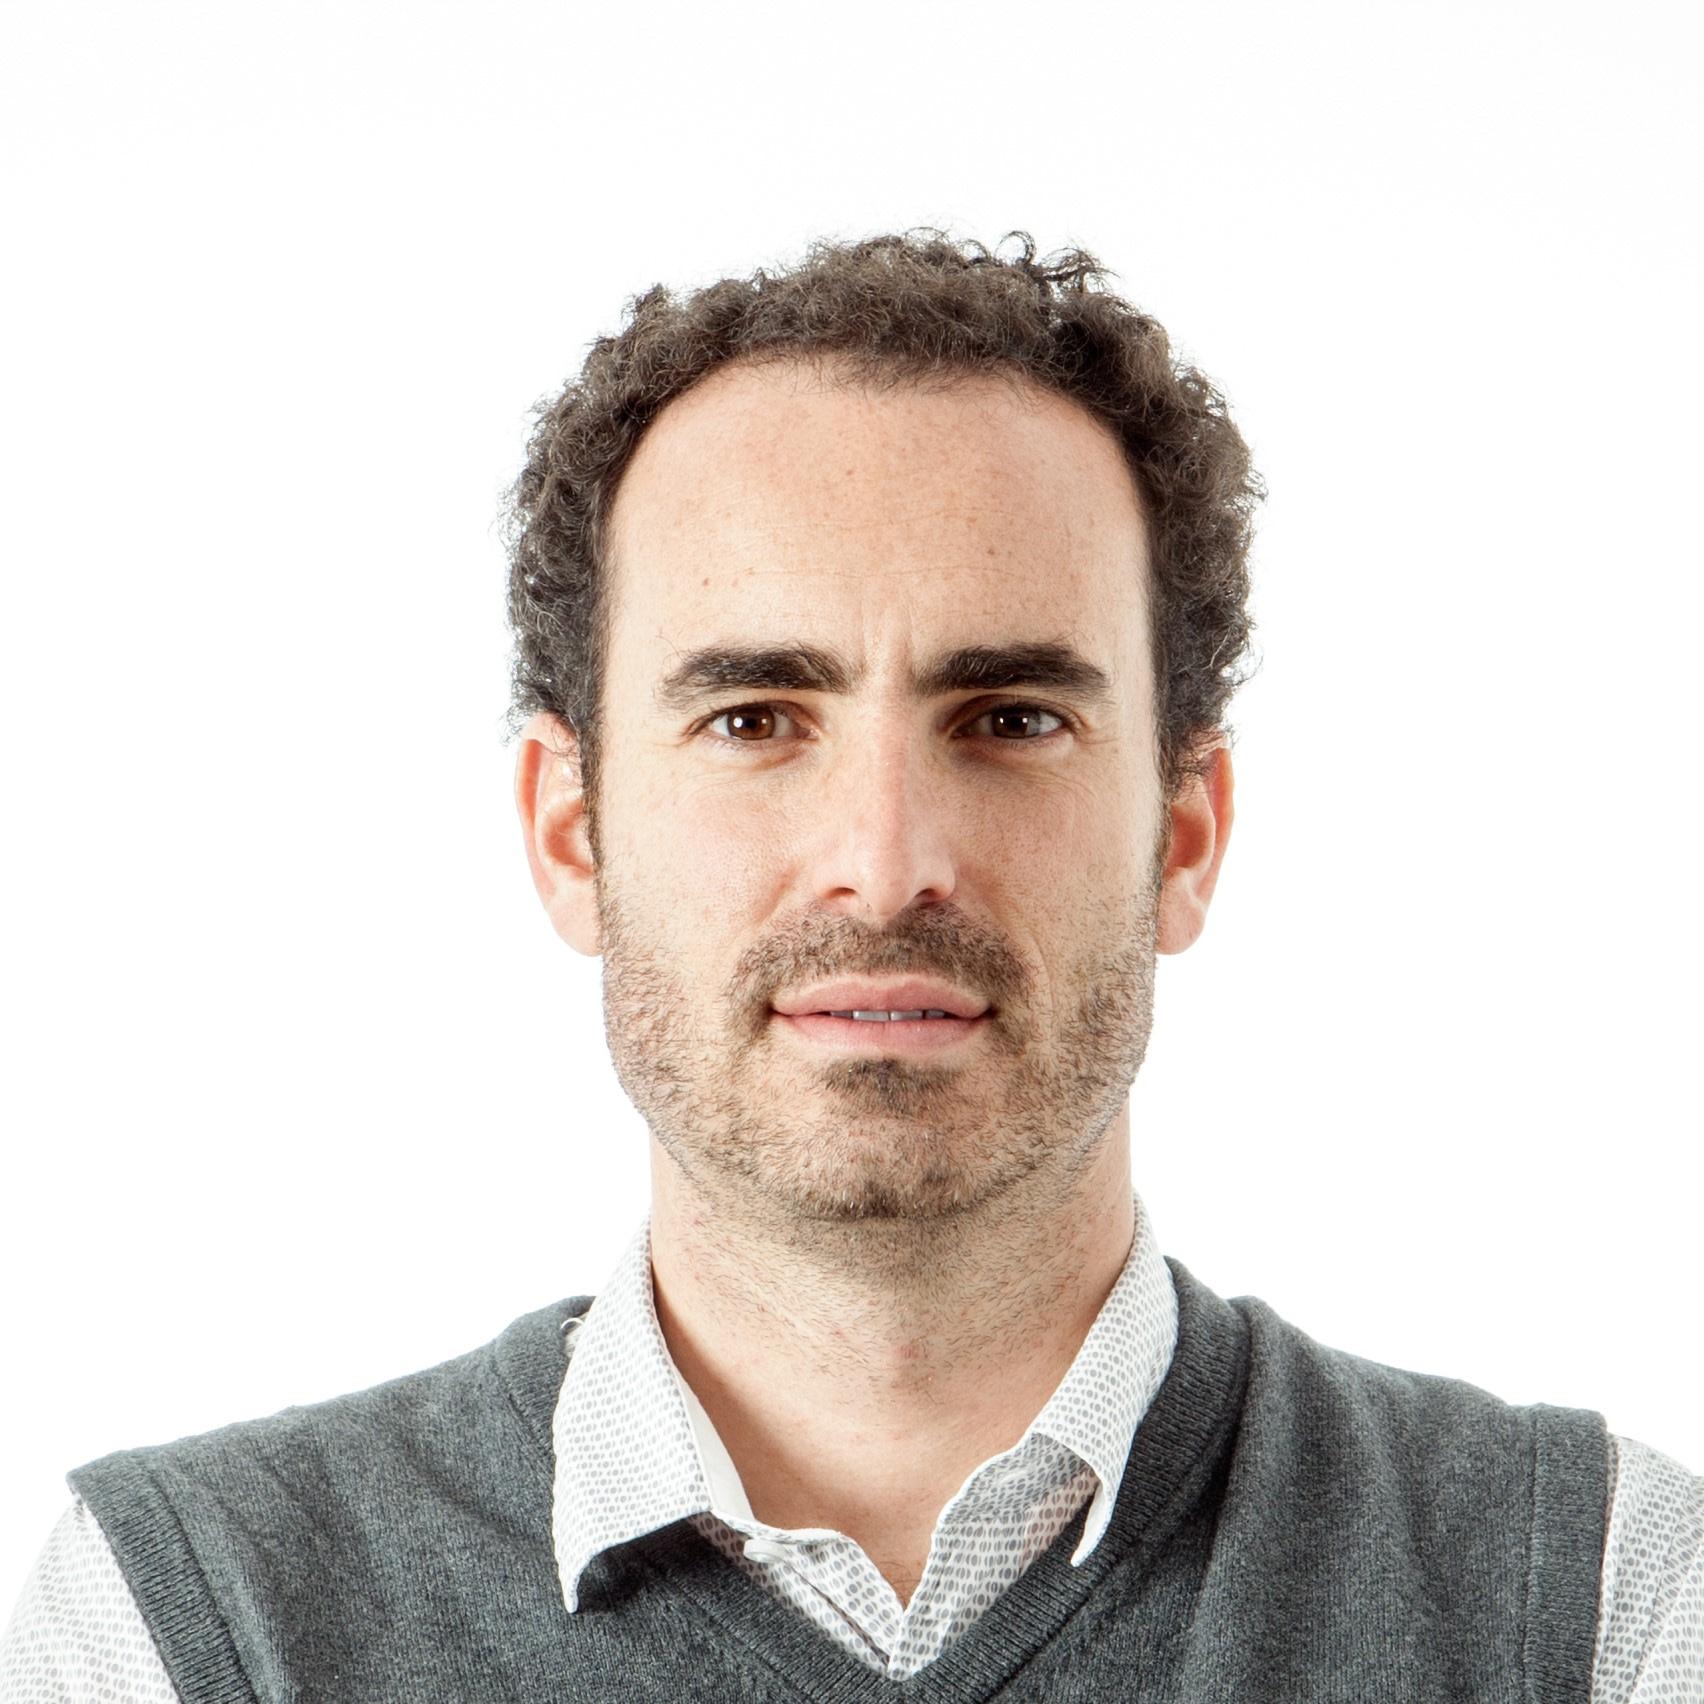 Profile image for Víctor López Saavedra